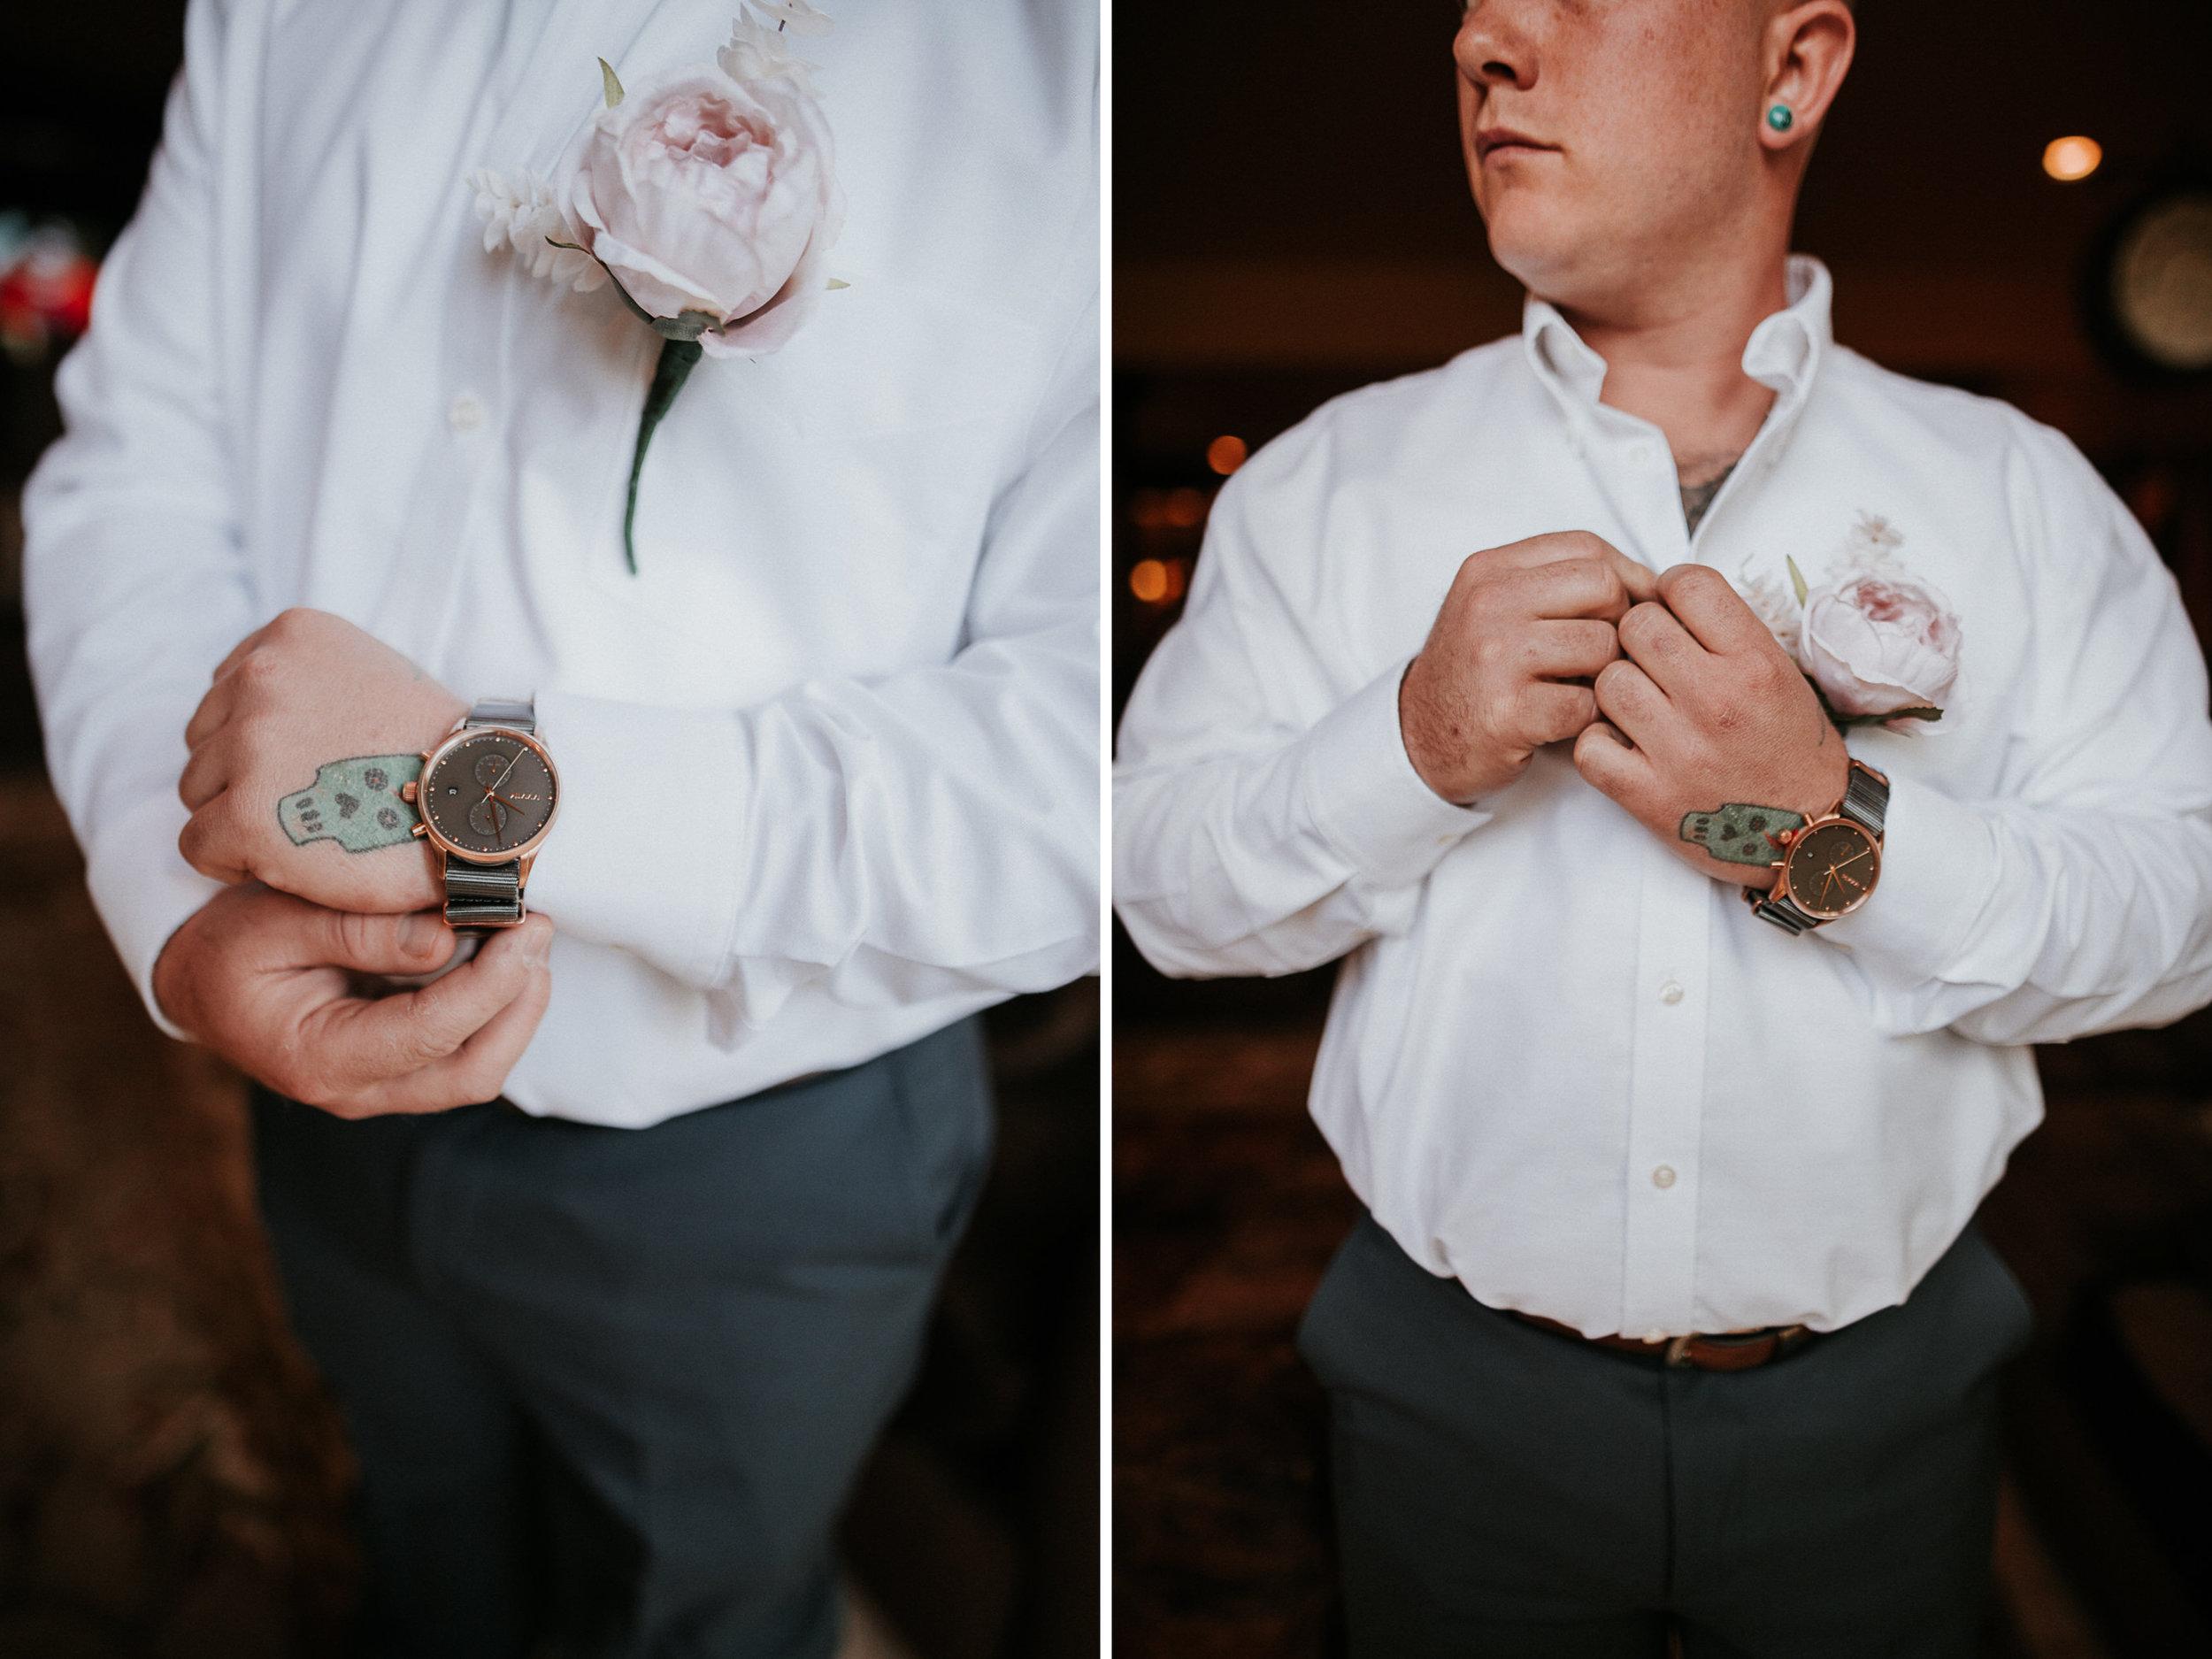 st. louis wedding photographer Zach&Rosalie - Lake Dillon CO Elopement 2.jpg